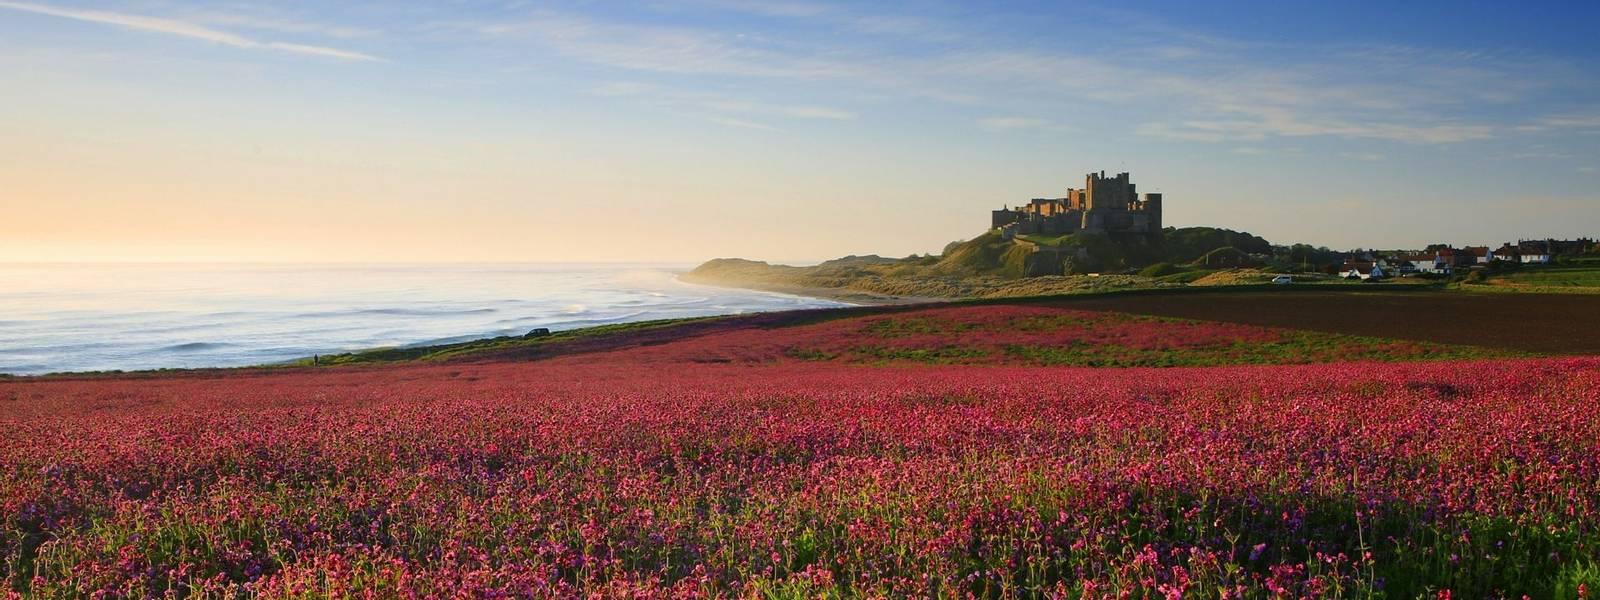 Northumberland_Bamburgh_Castle_AdobeStock_249566495.jpeg